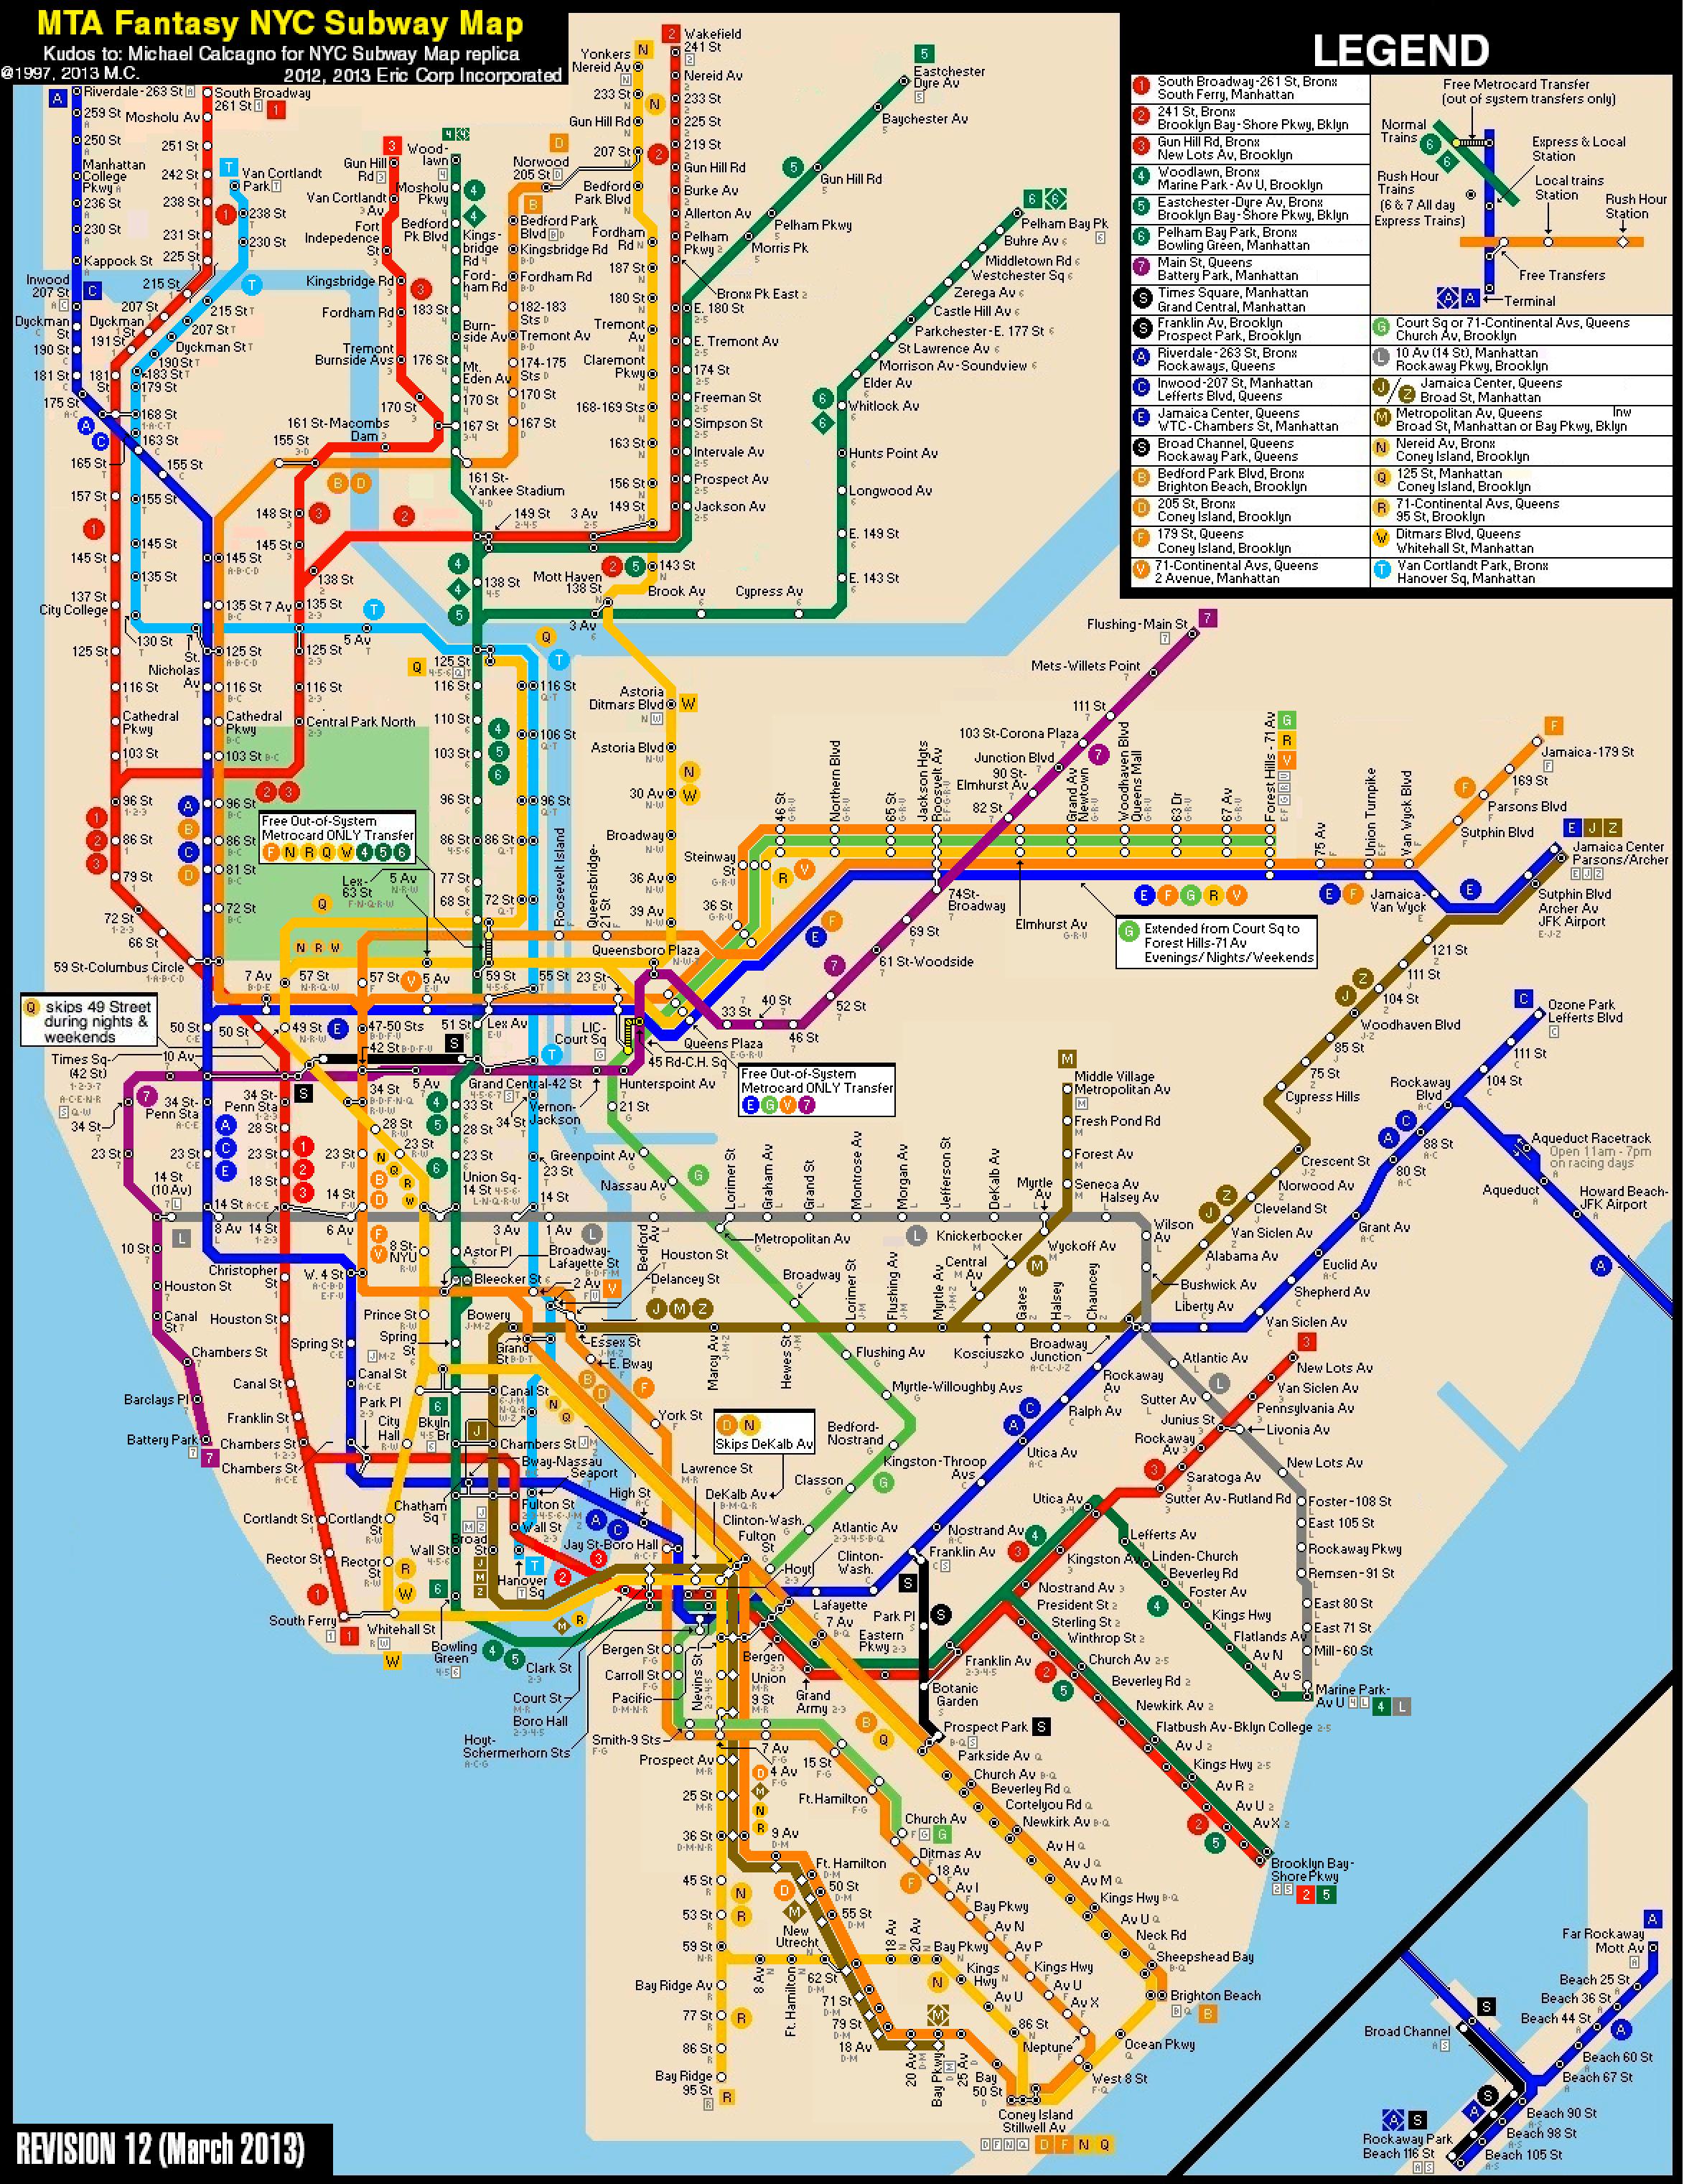 New York City Subway Fantasy Map Revision 12 By